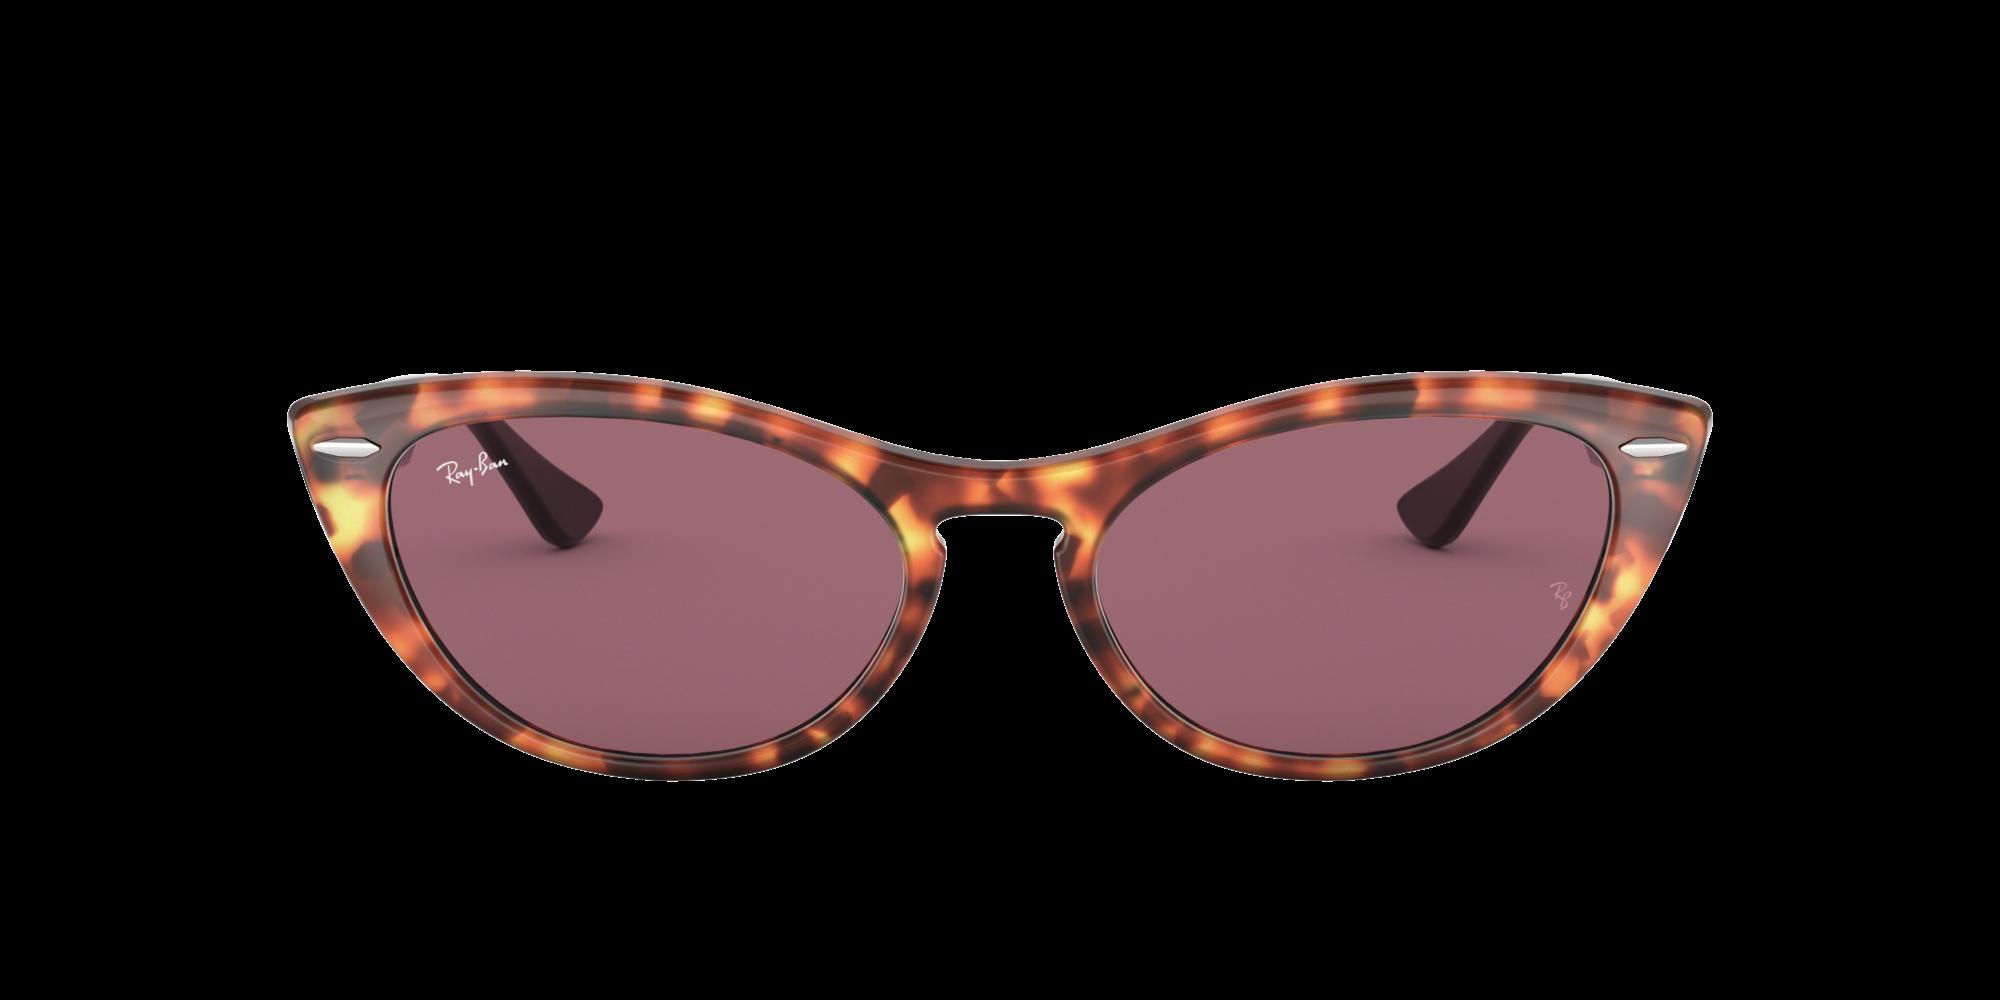 5b41ff0f7b5 Sunglasses Ray-Ban Nina Tortoise RB4314N 1249U0 54-18 Medium Photochromic